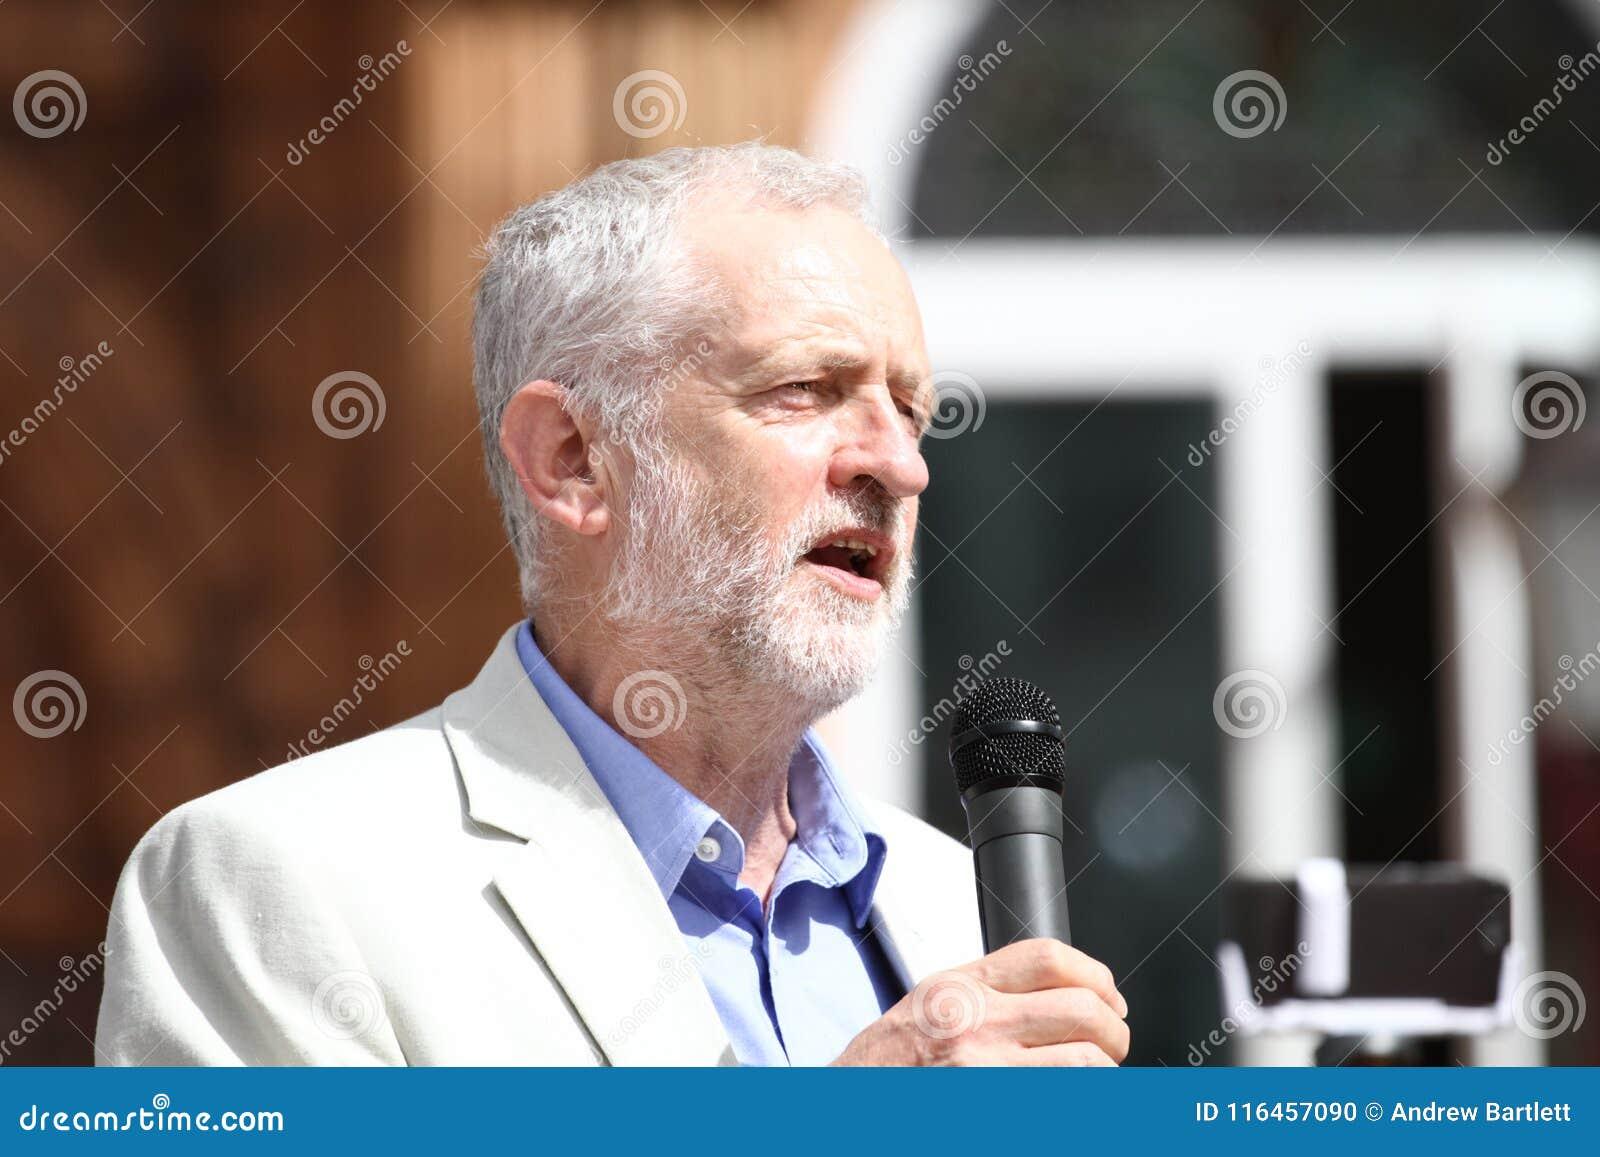 Jeremy Corbyn besucht Redhouse, Merthyr Tydfil, Südwales, Großbritannien